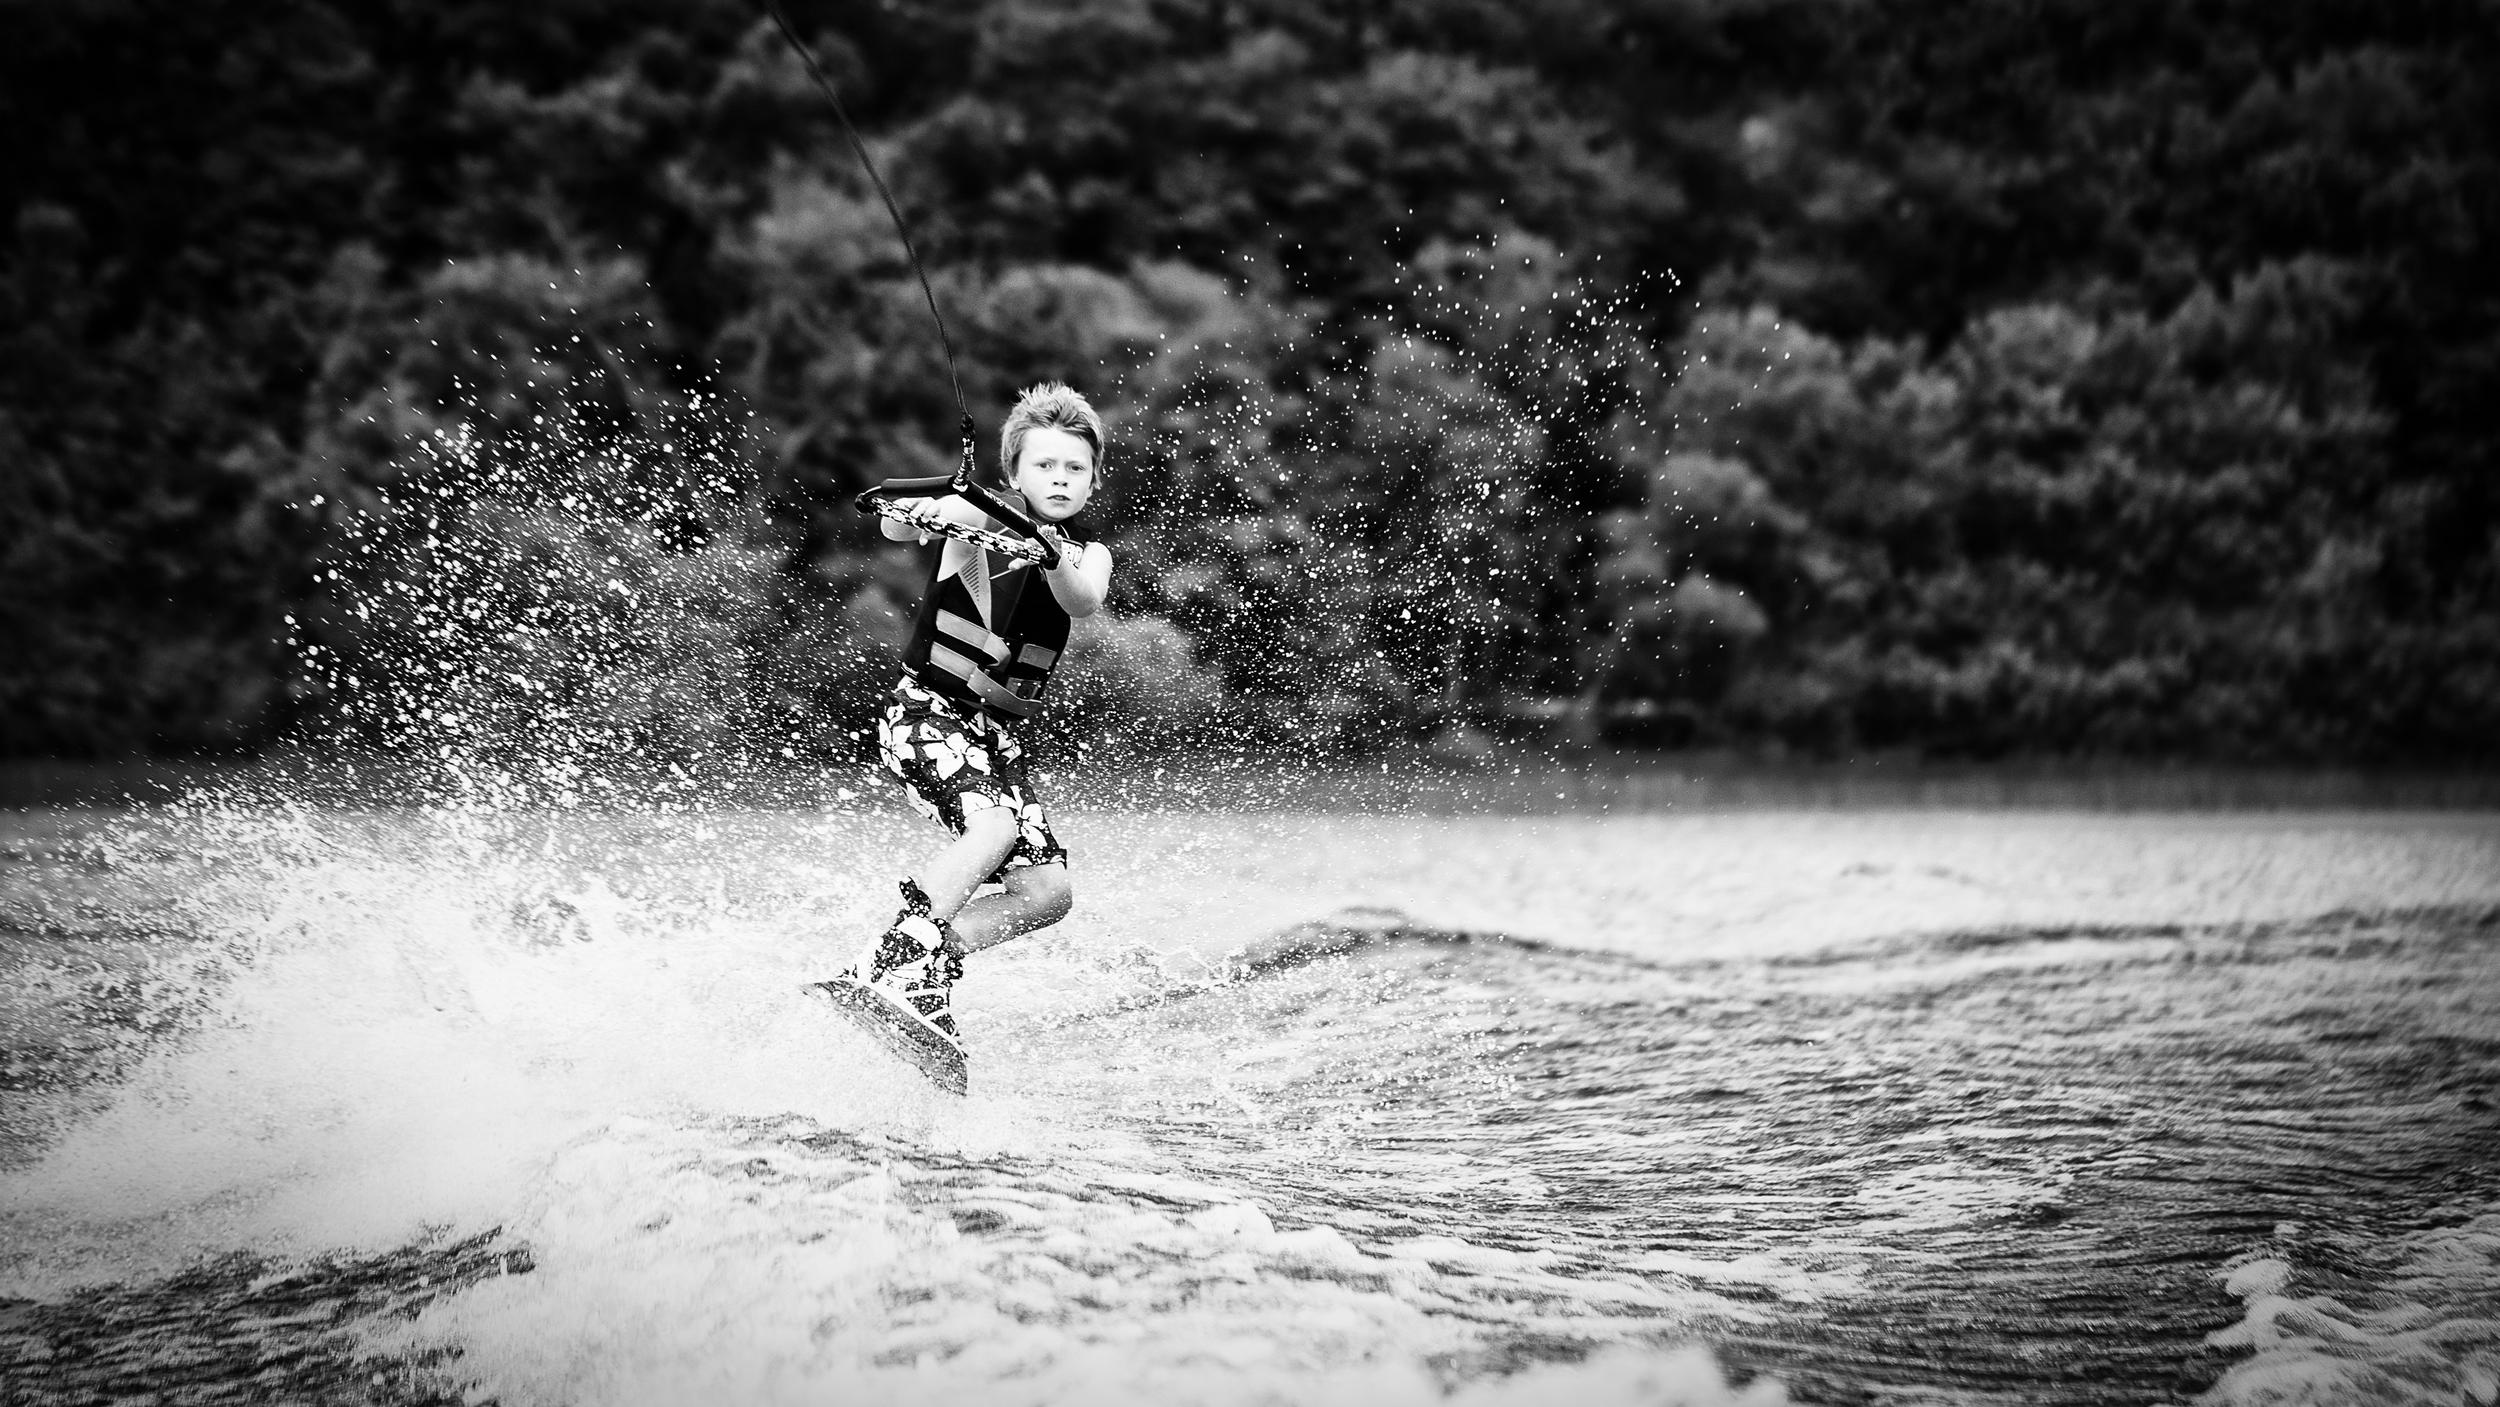 Child Photographer - Fargo, ND The Photo Dad